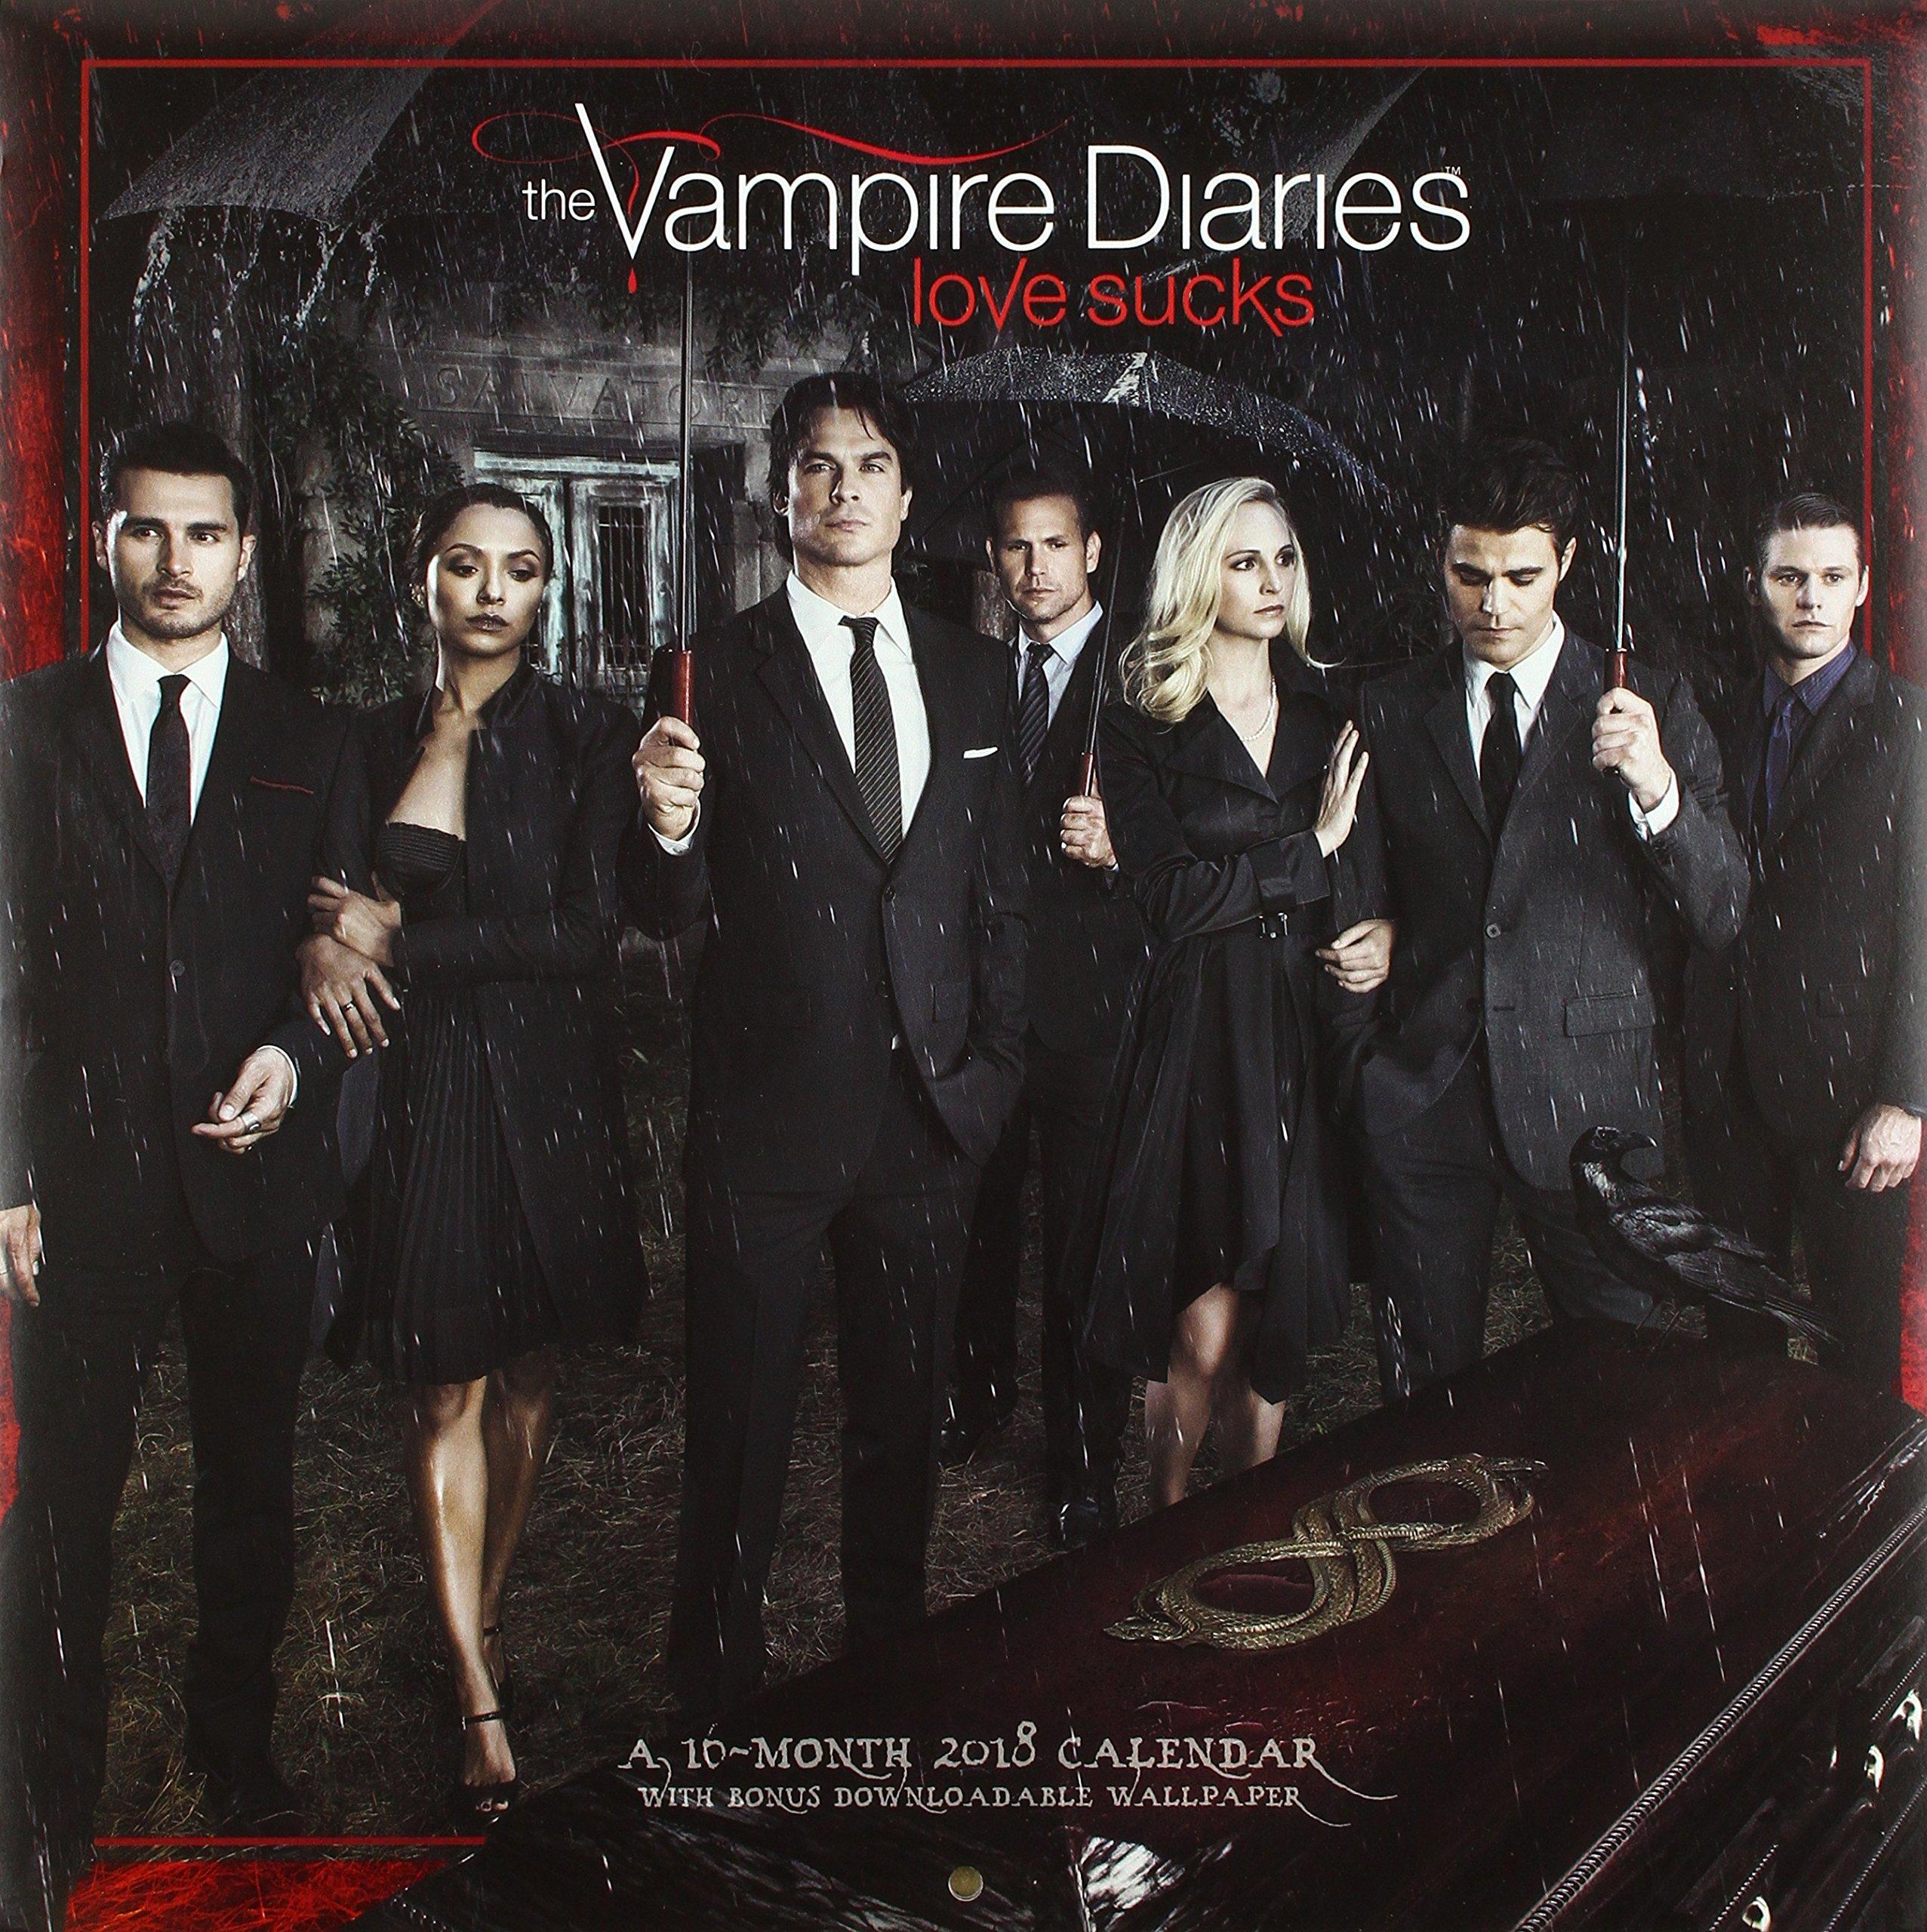 The Vampire Diaries 2018 Calen: Amazon.es: ACCO Brands ...